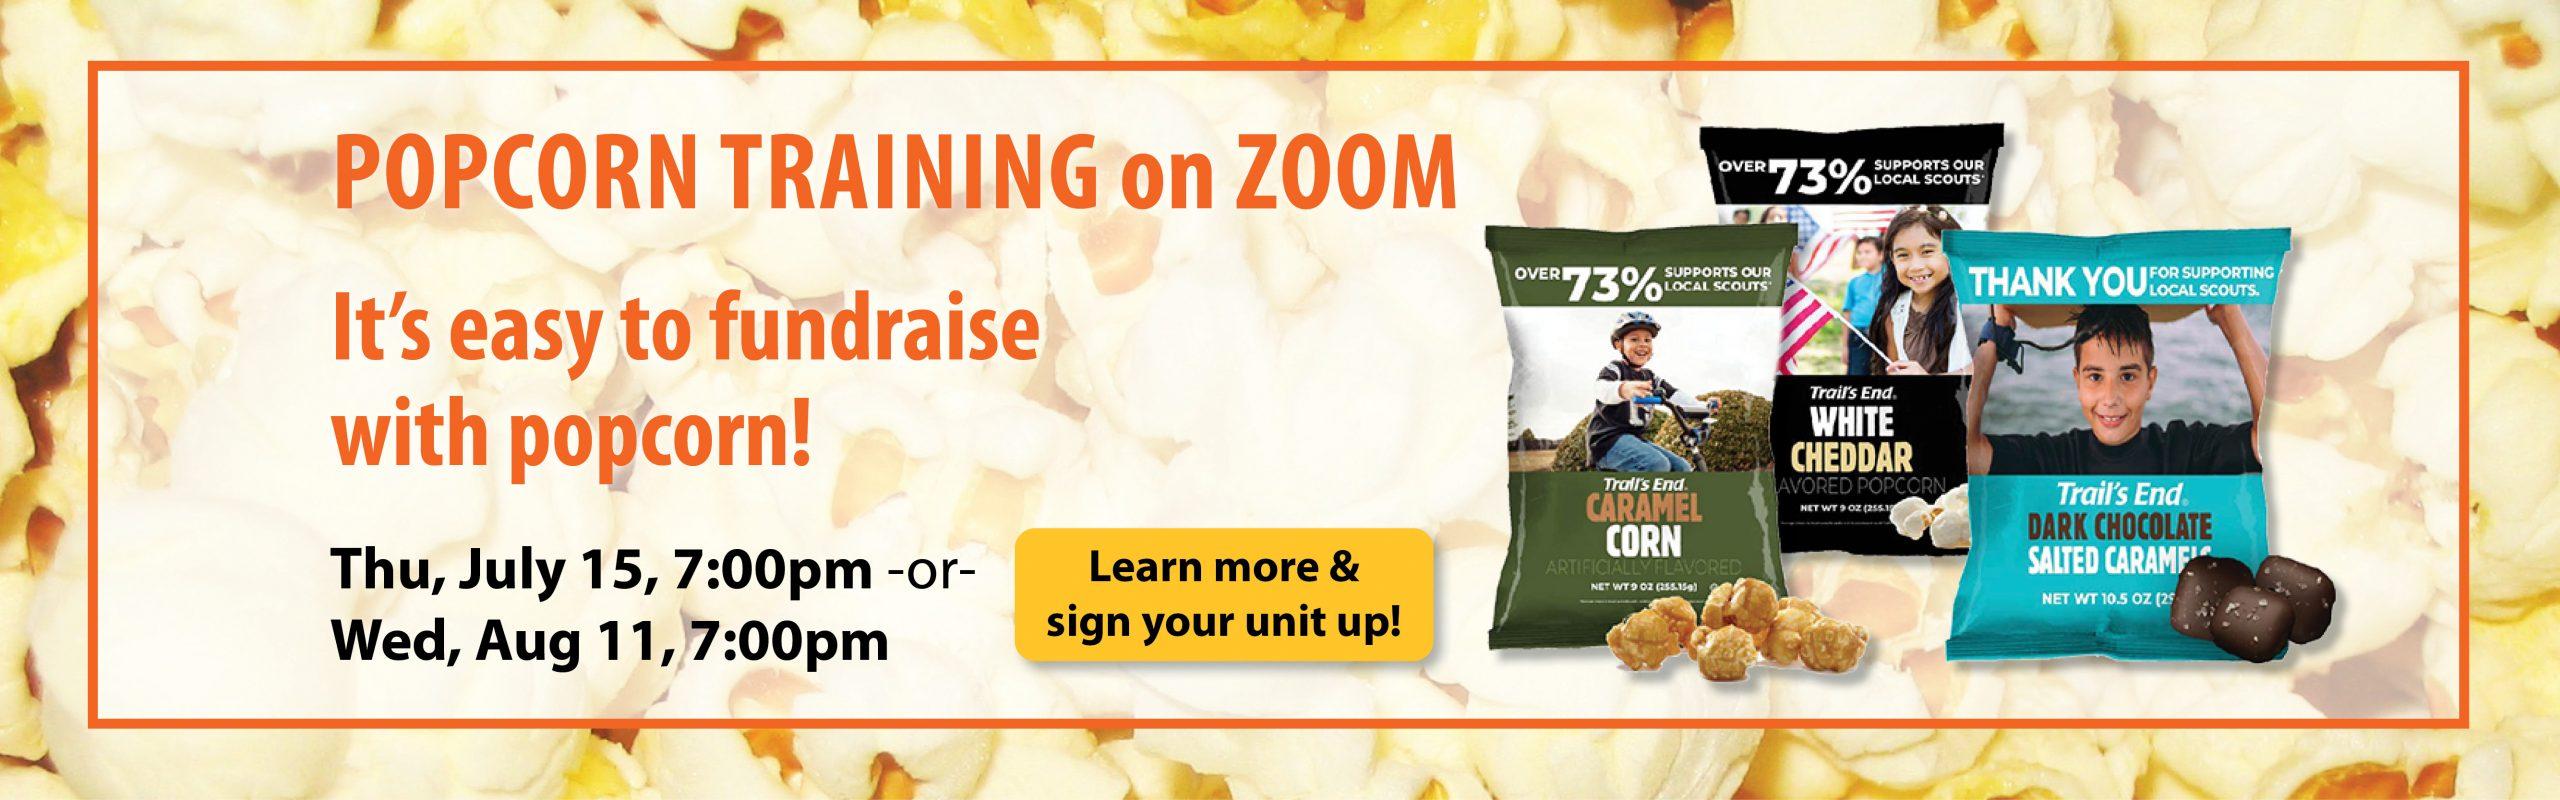 2021 Popcorn Training banner